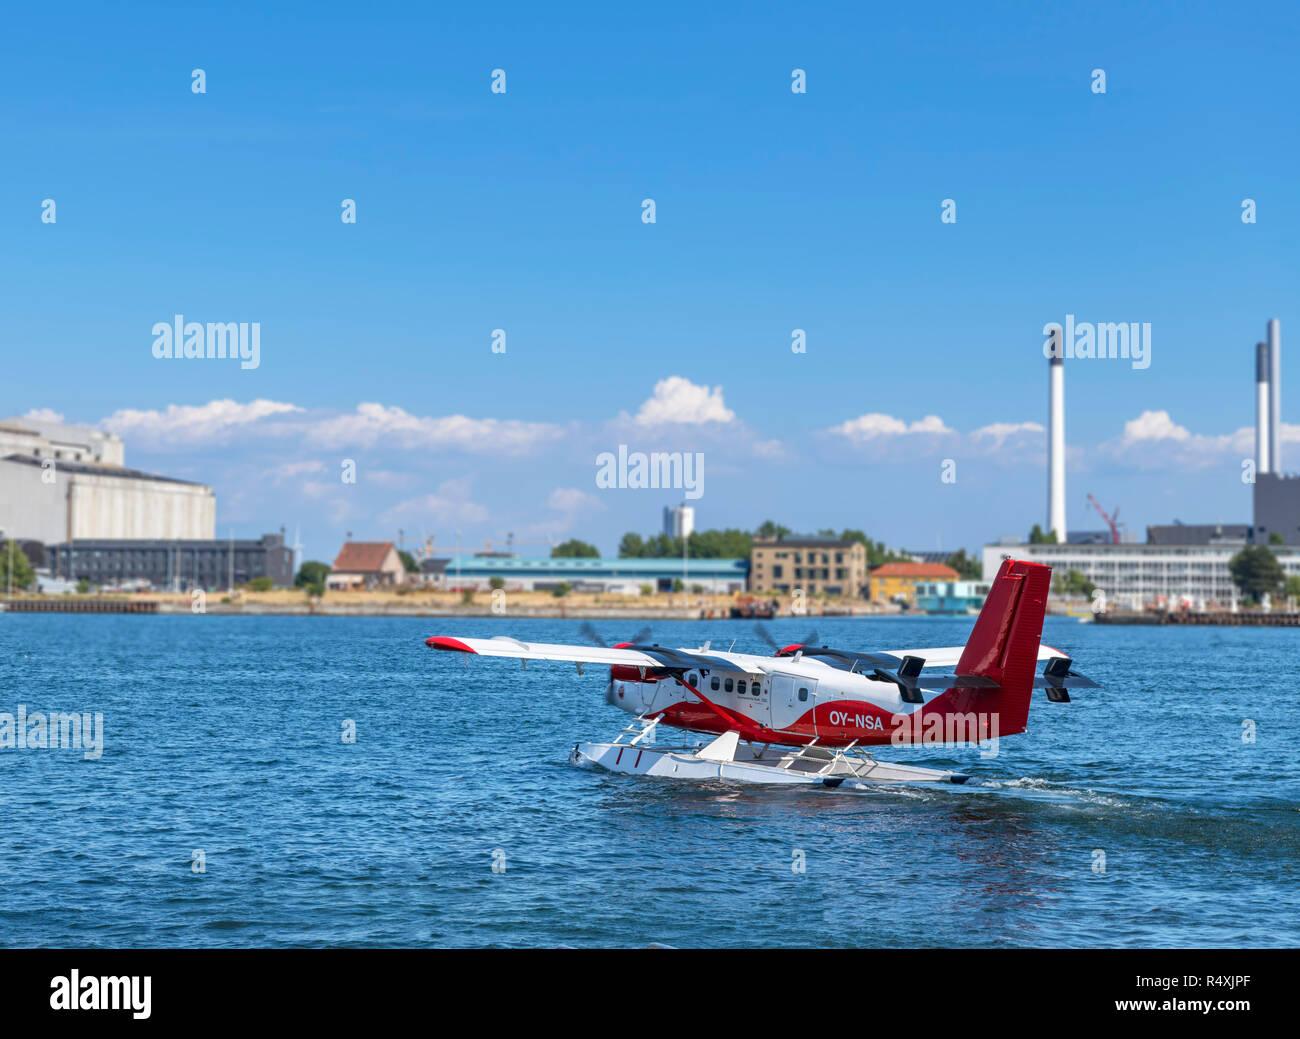 A Twin Otter DHC-6-300 seaplane taxiing off the Langelinie promenade, Copenhagen, Denmark - Stock Image